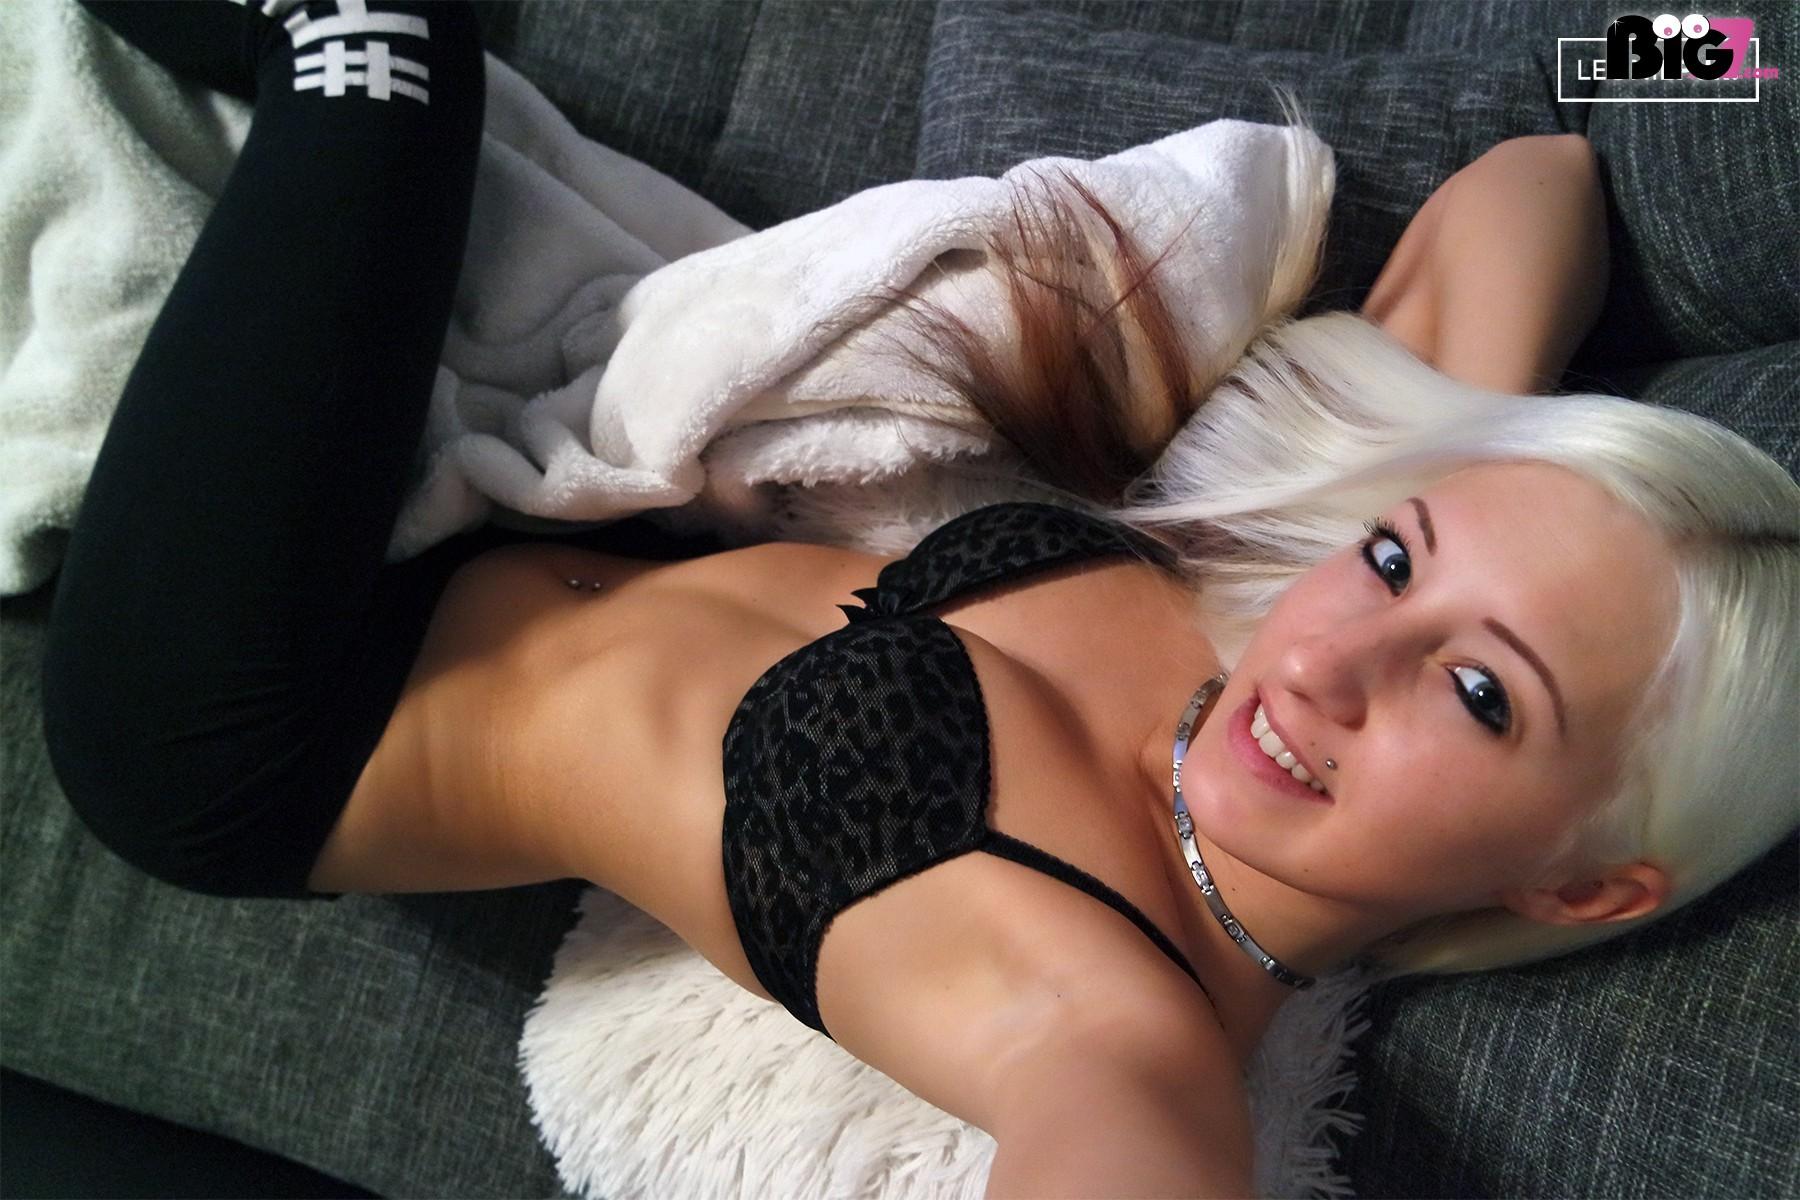 leonie-pur.com